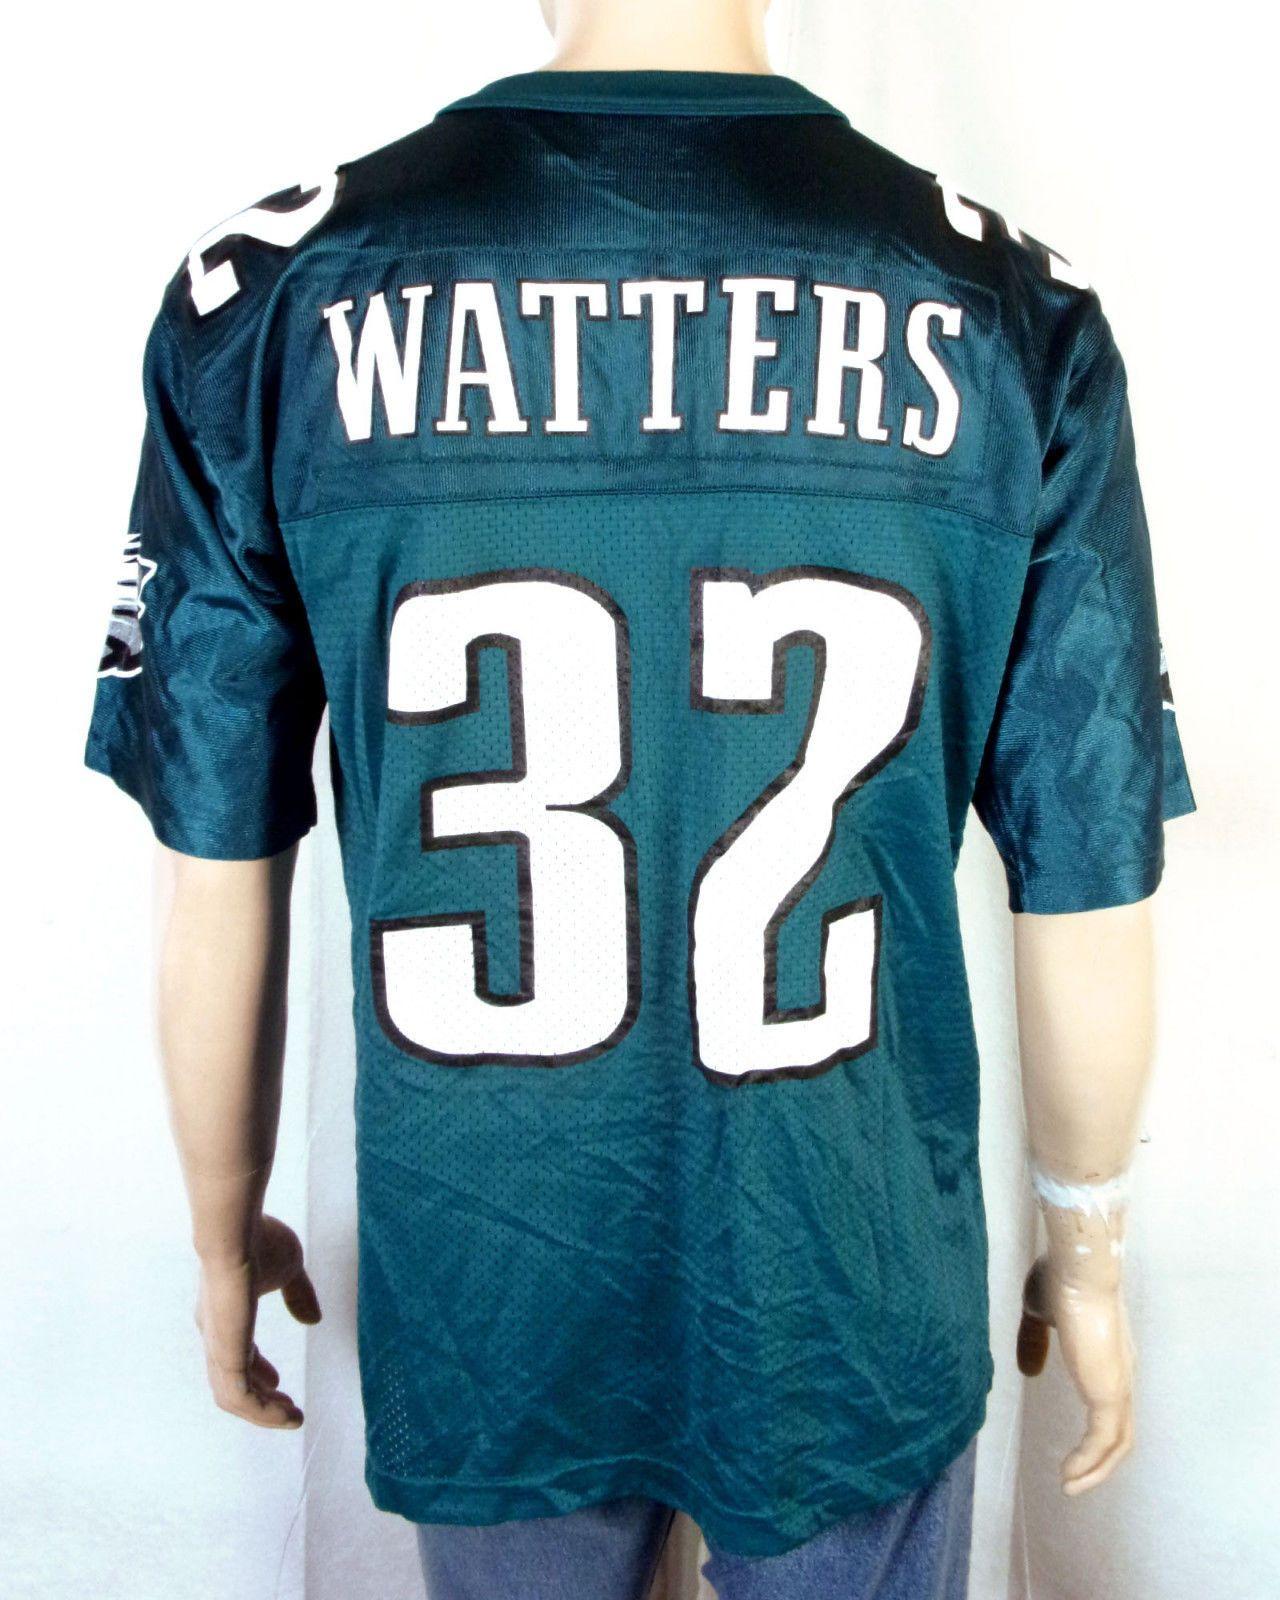 new concept b00f1 500b2 vtg 90s Starter NWOT mint Ricky Watters NFL Jersey ...